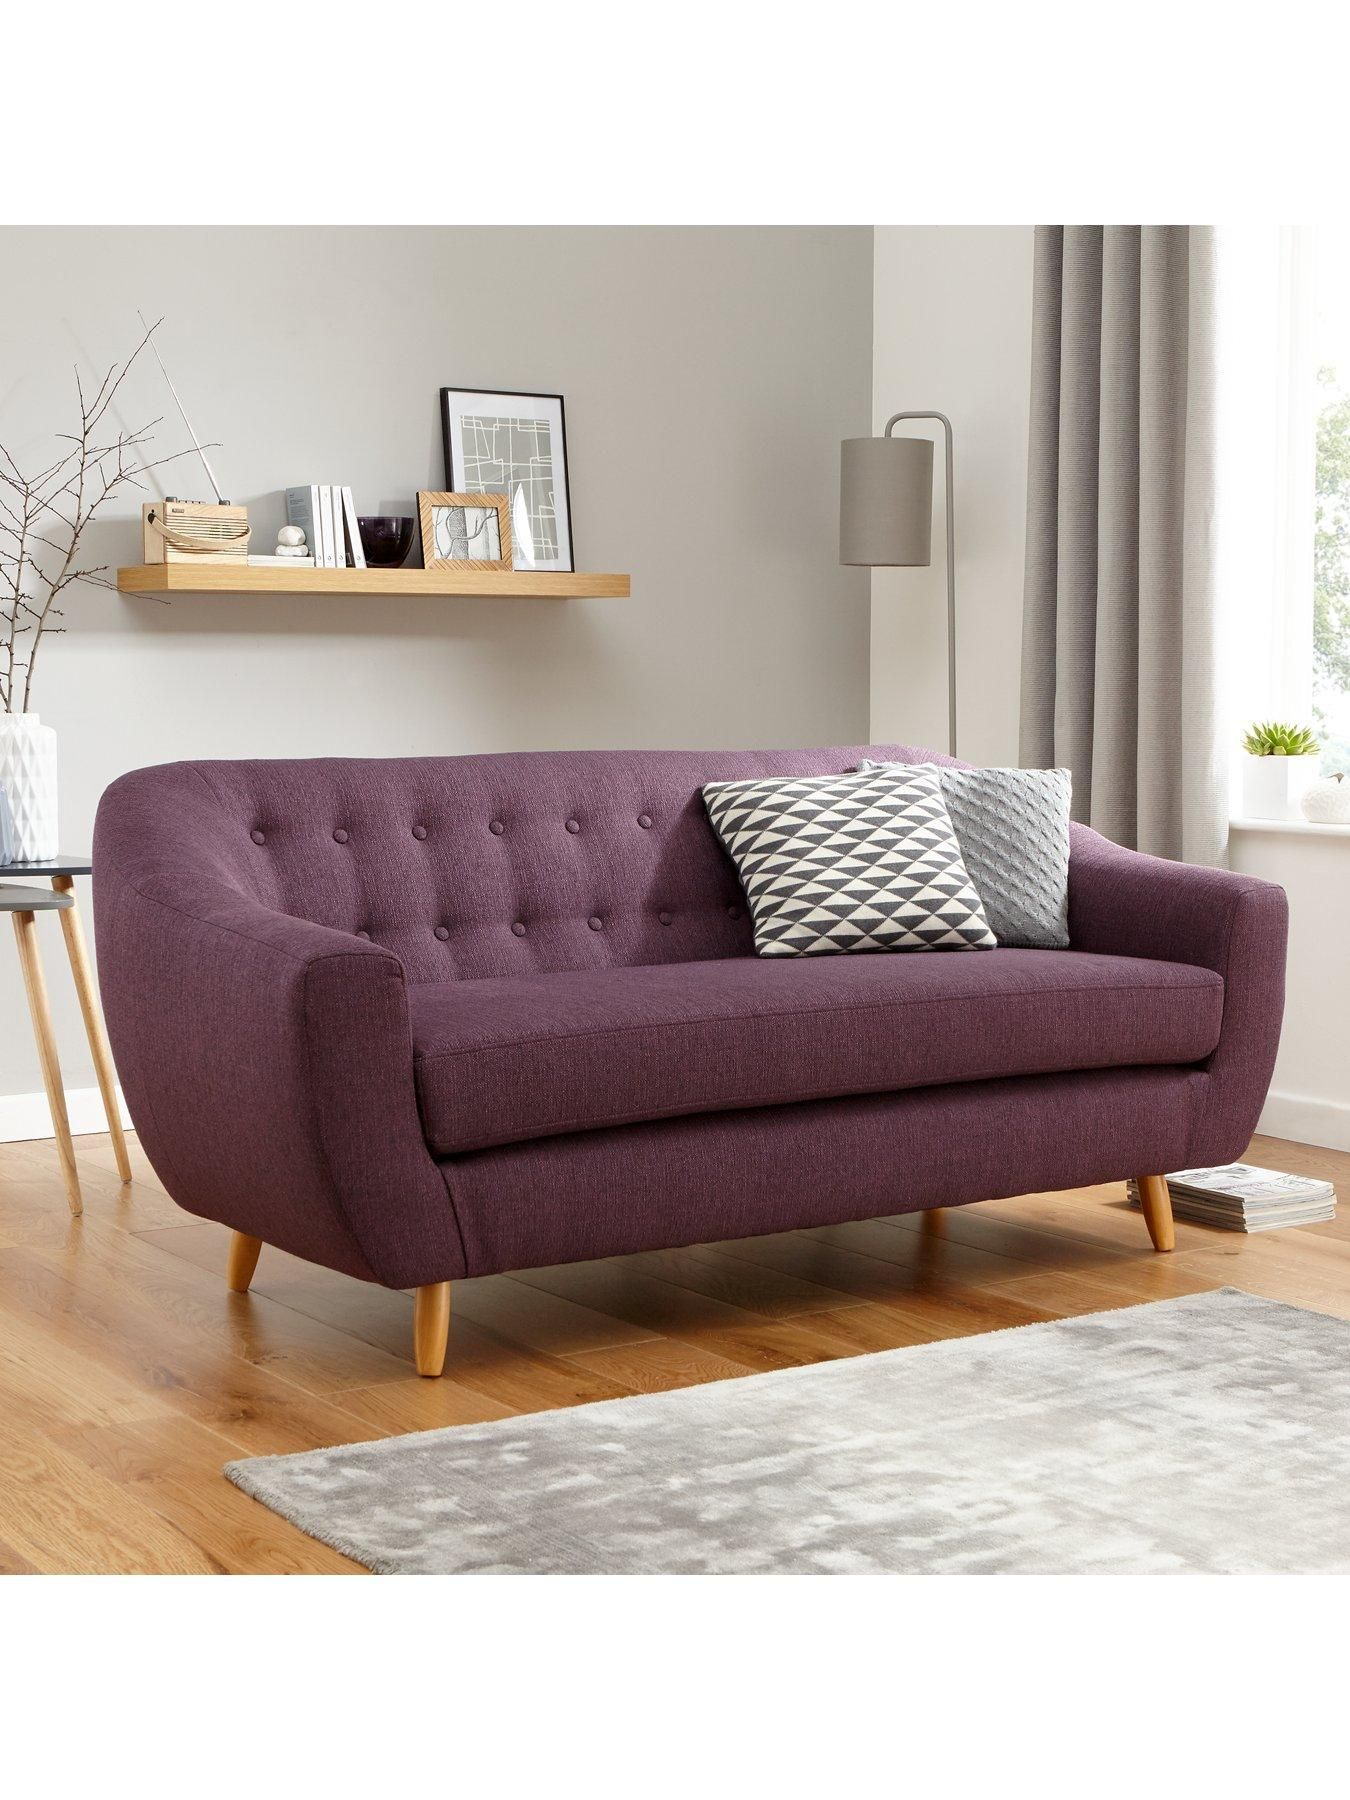 Claudia 3 Seater Fabric Sofa | Interior | Fabric sofa, Sofa ...